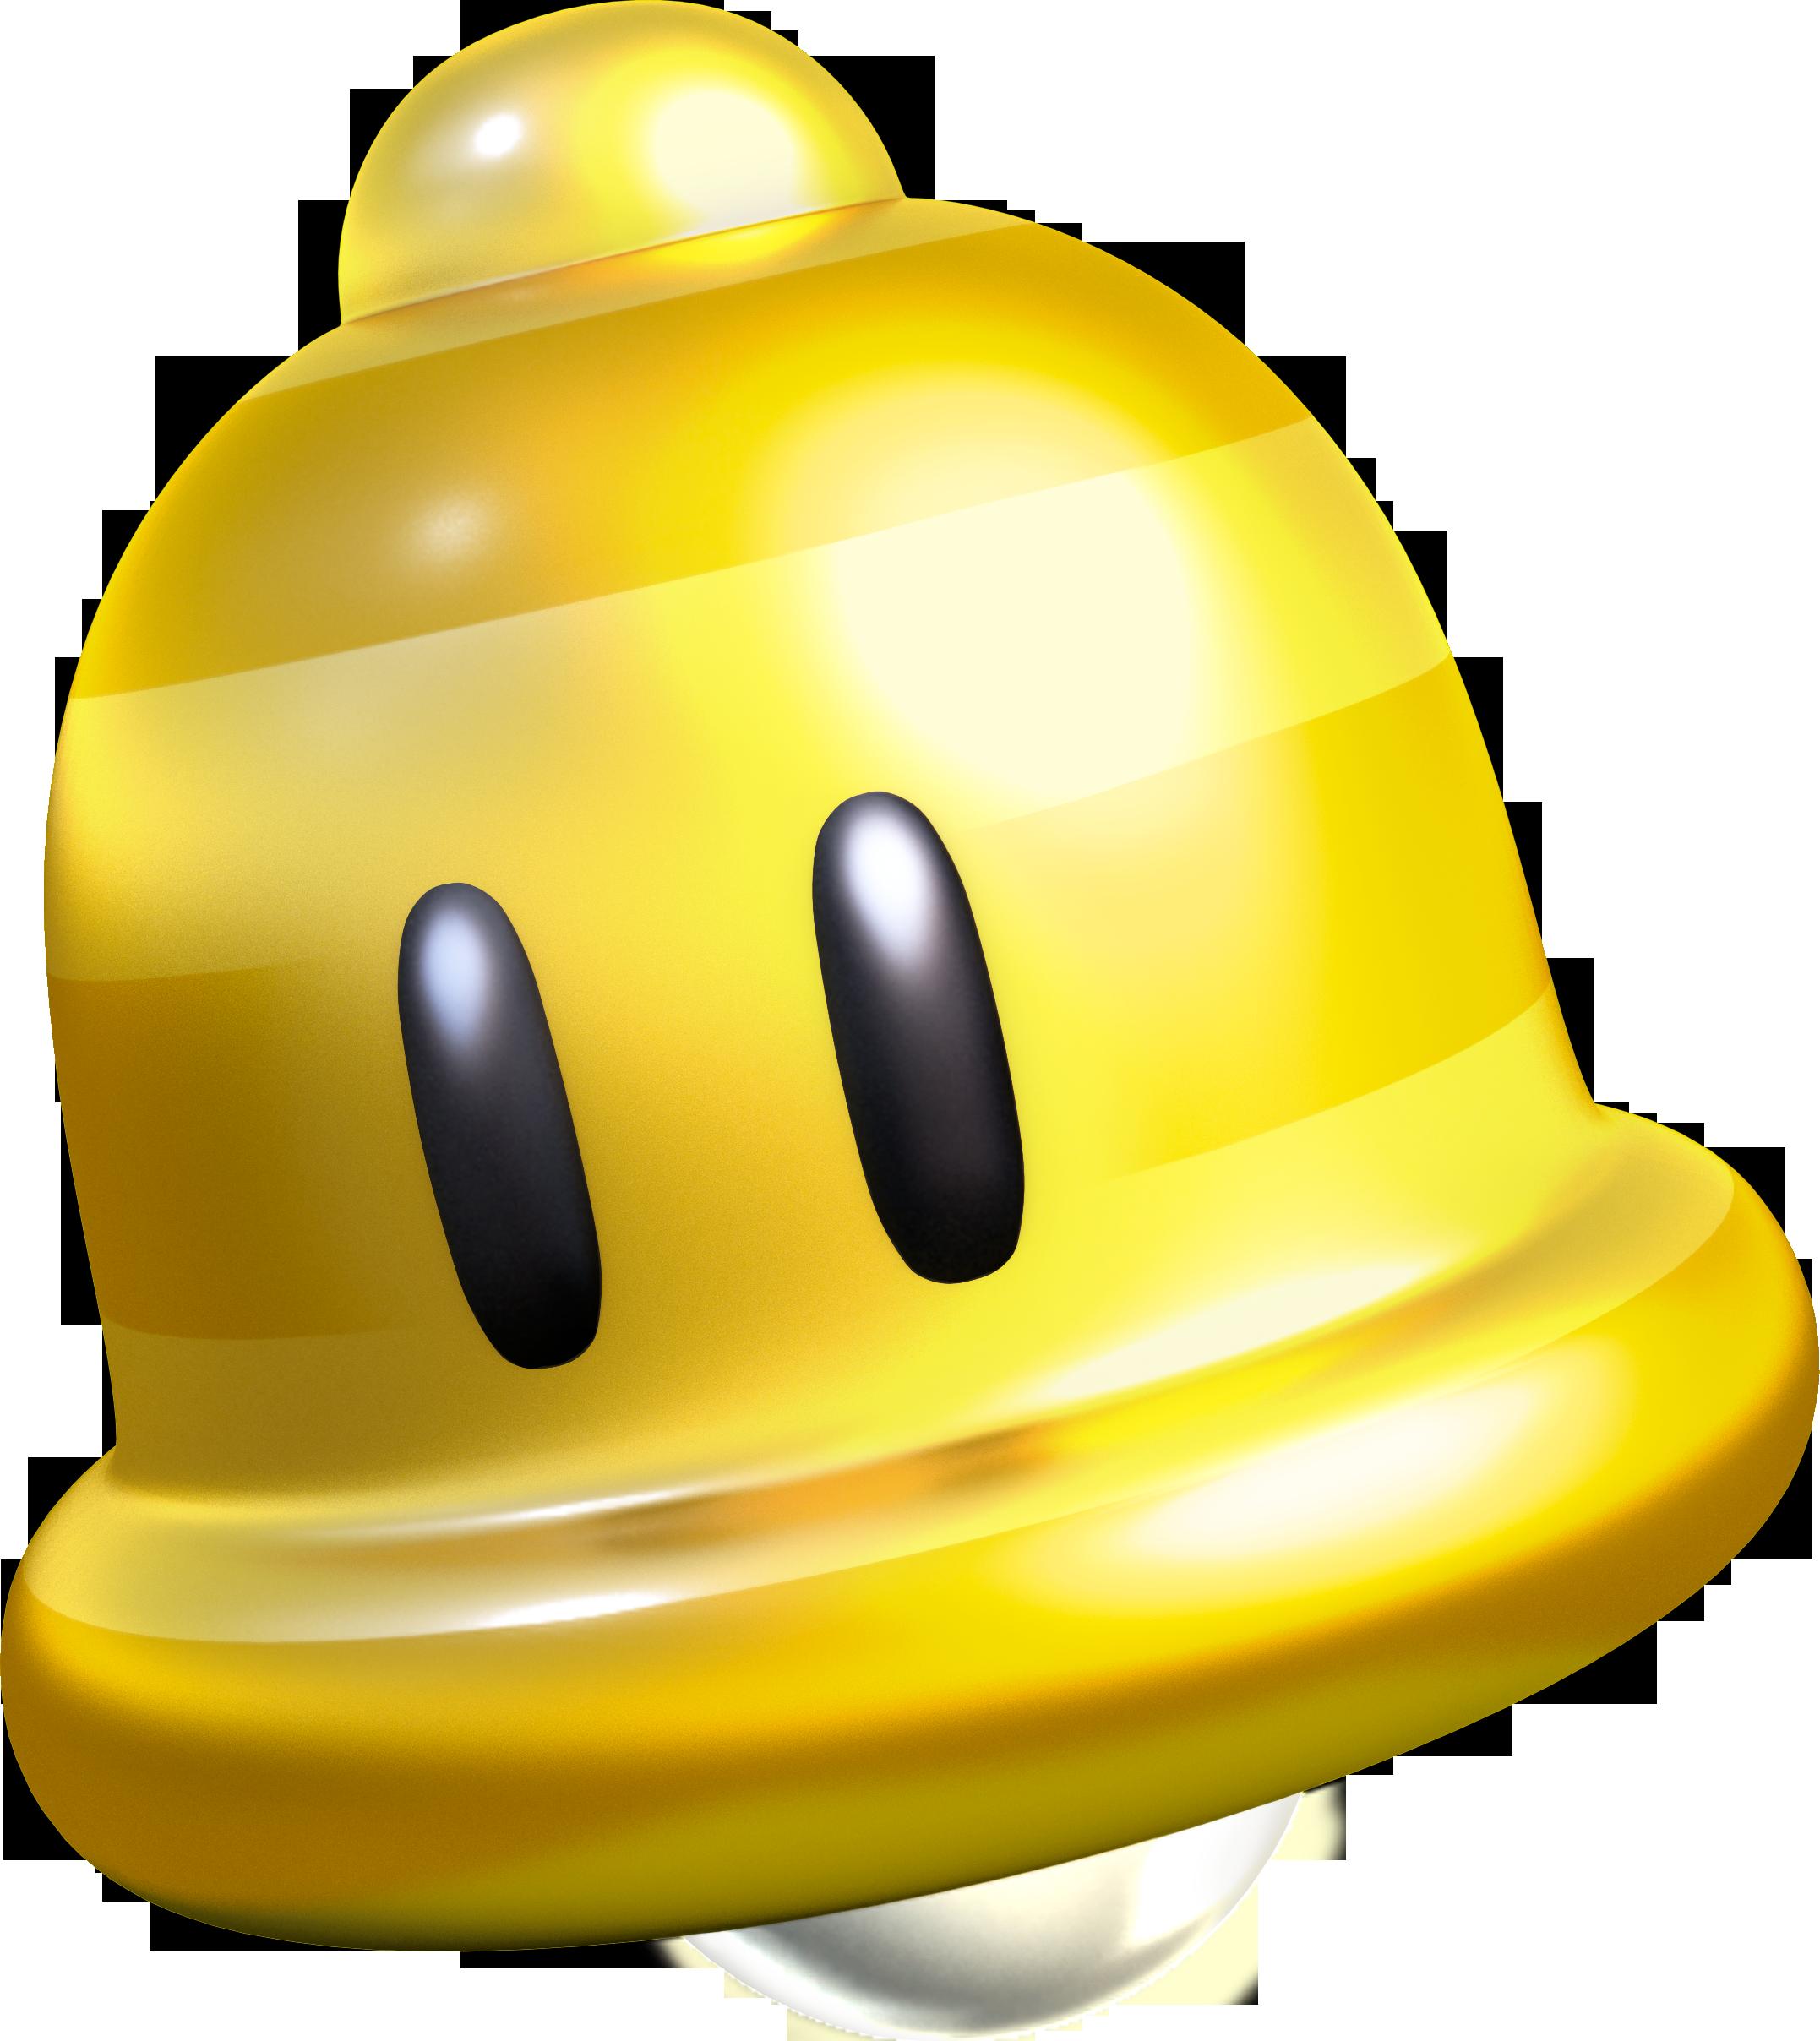 A Bell Super Mario 3d Super Mario Art Super Mario